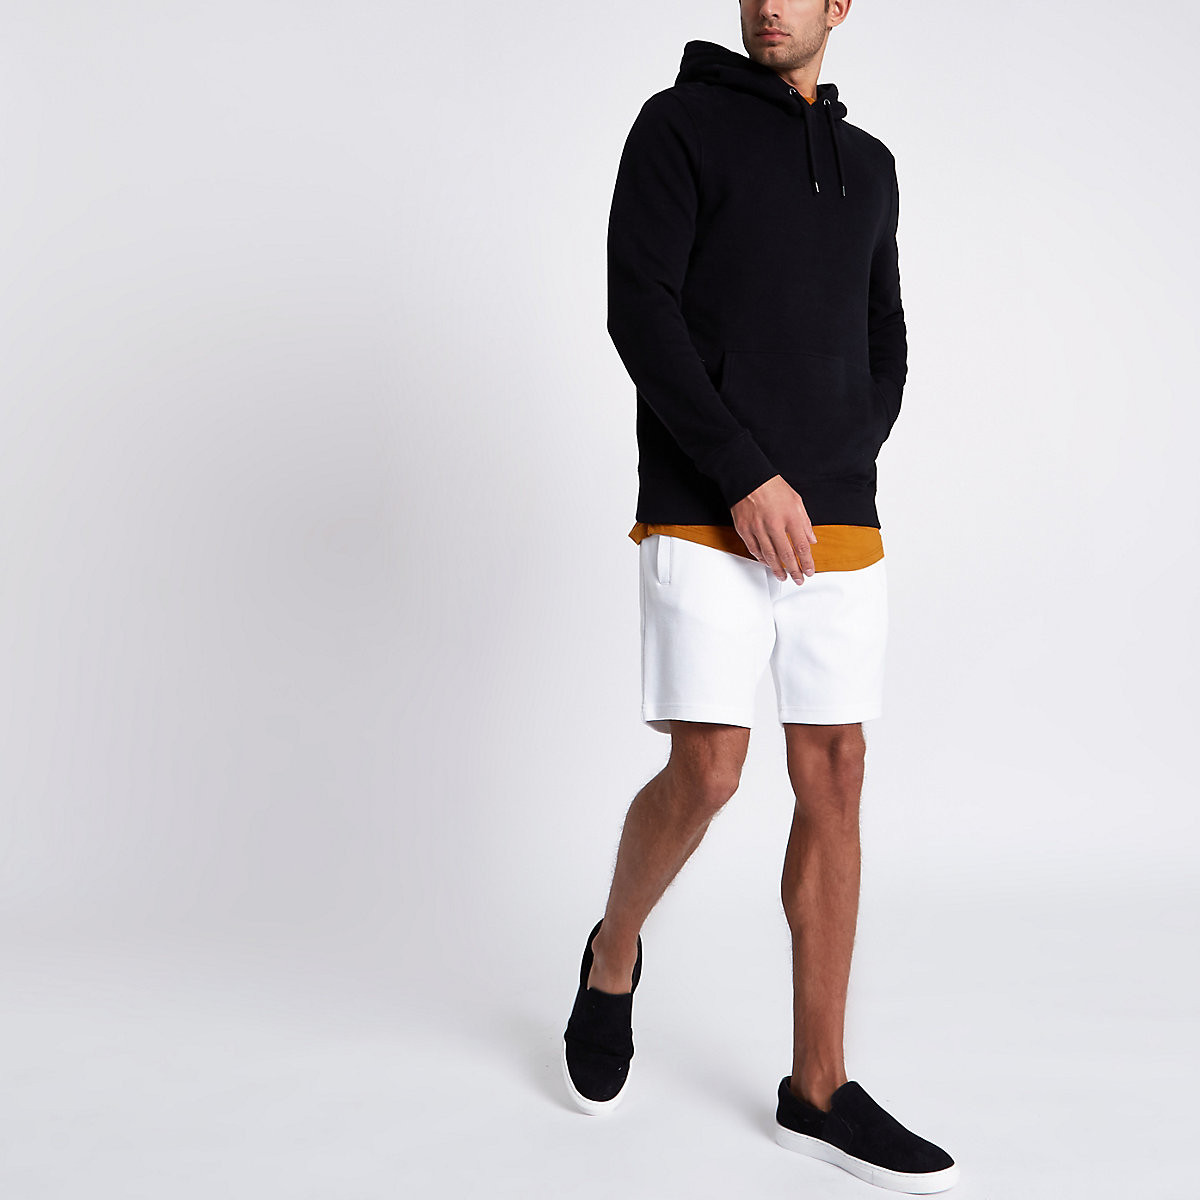 White pique shorts